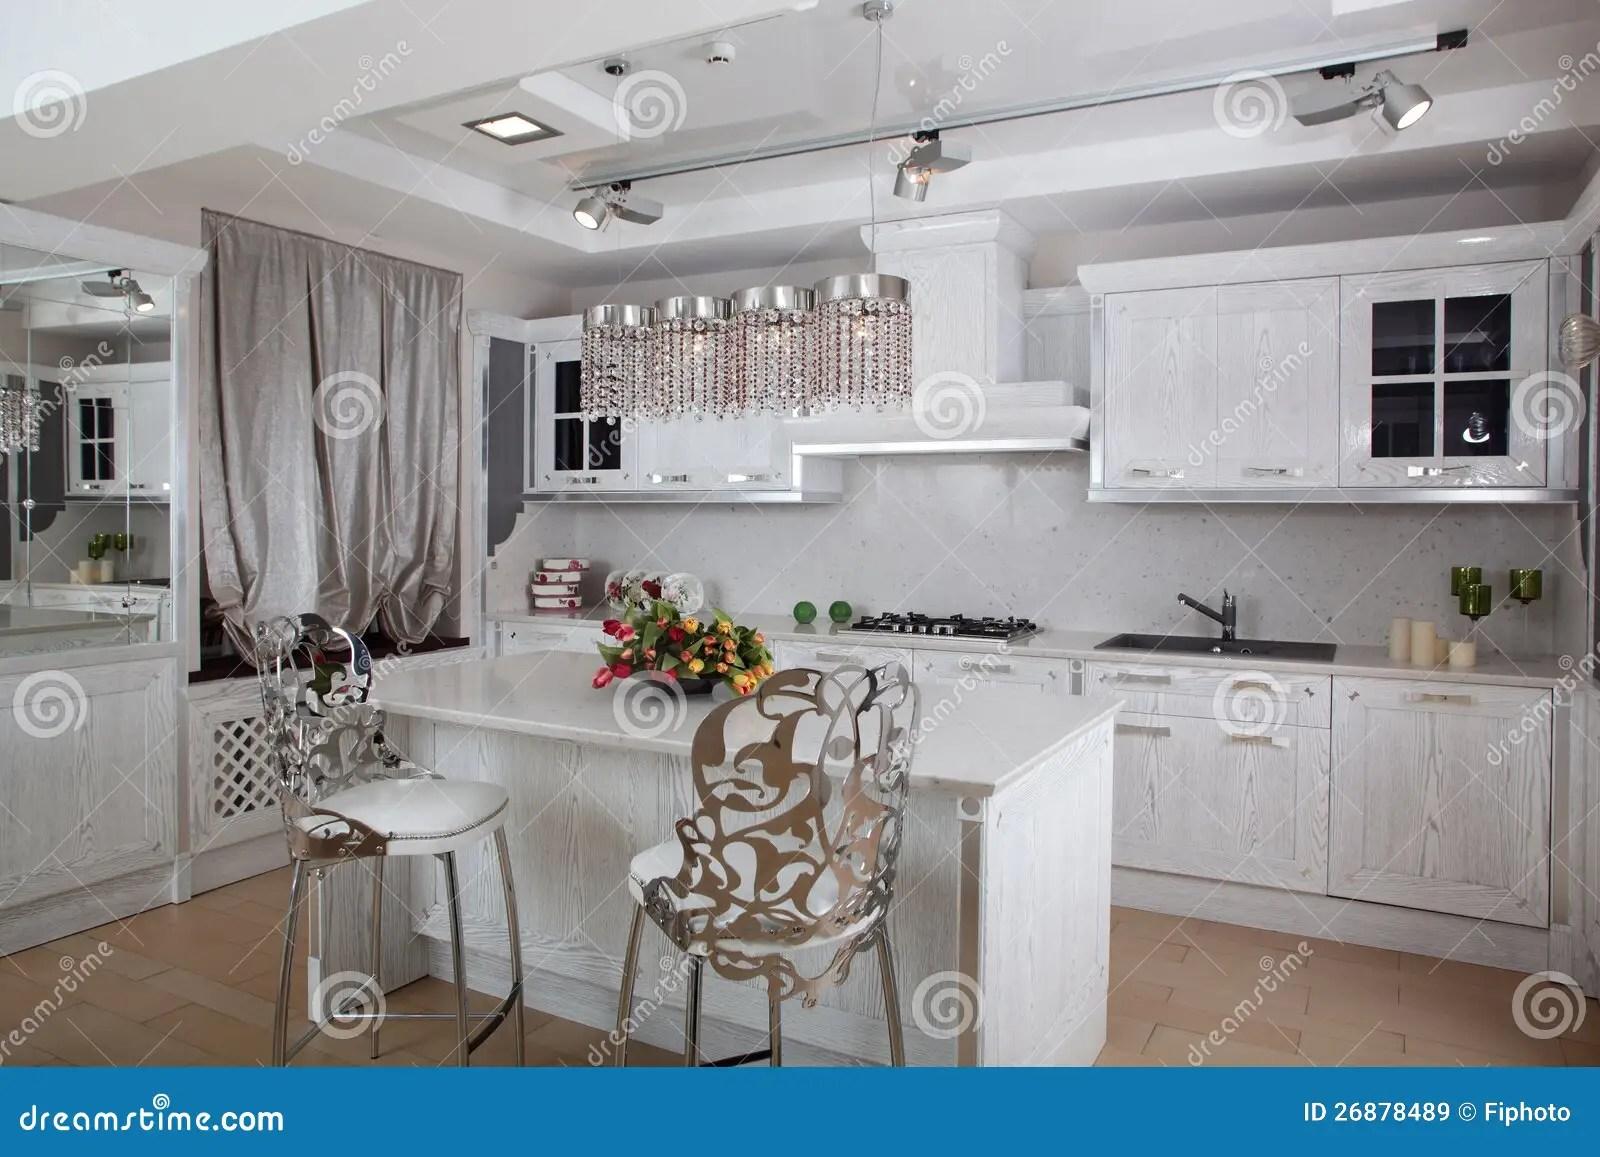 european kitchens ceramic kitchen cabinet knobs 明亮的全新的欧洲厨房库存图片 图片包括有国内 任何地方 设计 装饰 明亮的全新的欧洲厨房